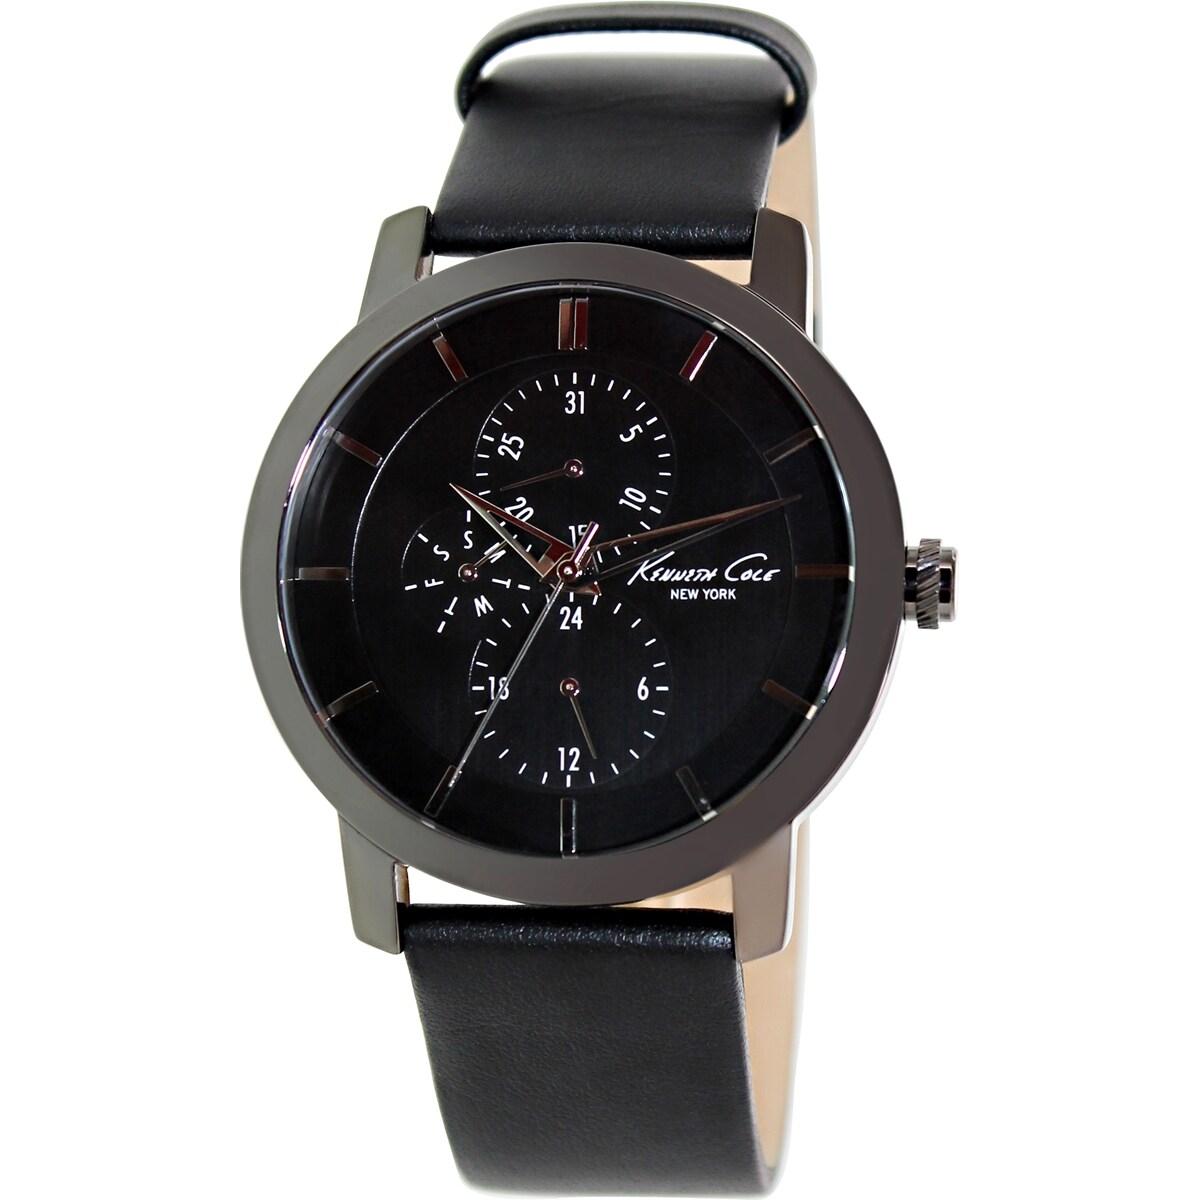 Kenneth Cole Men's KC8058 Black Leather Quartz Watch with Black Dial